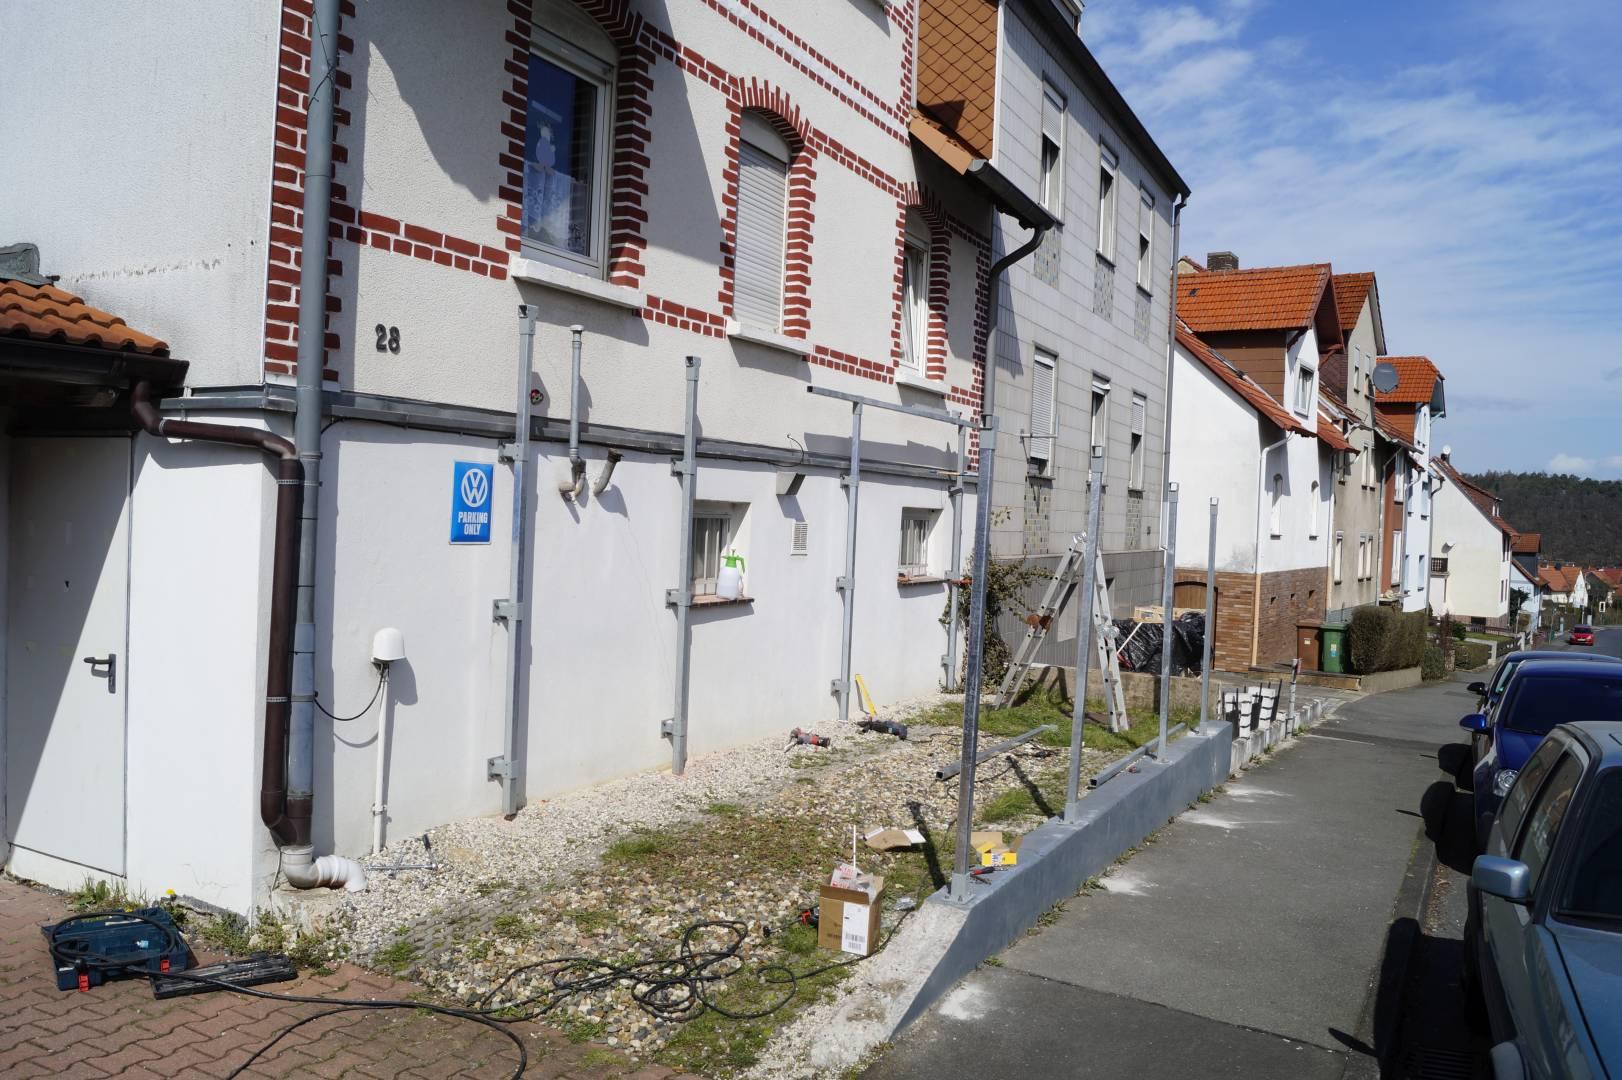 Carport_Aufbau_A07.jpg